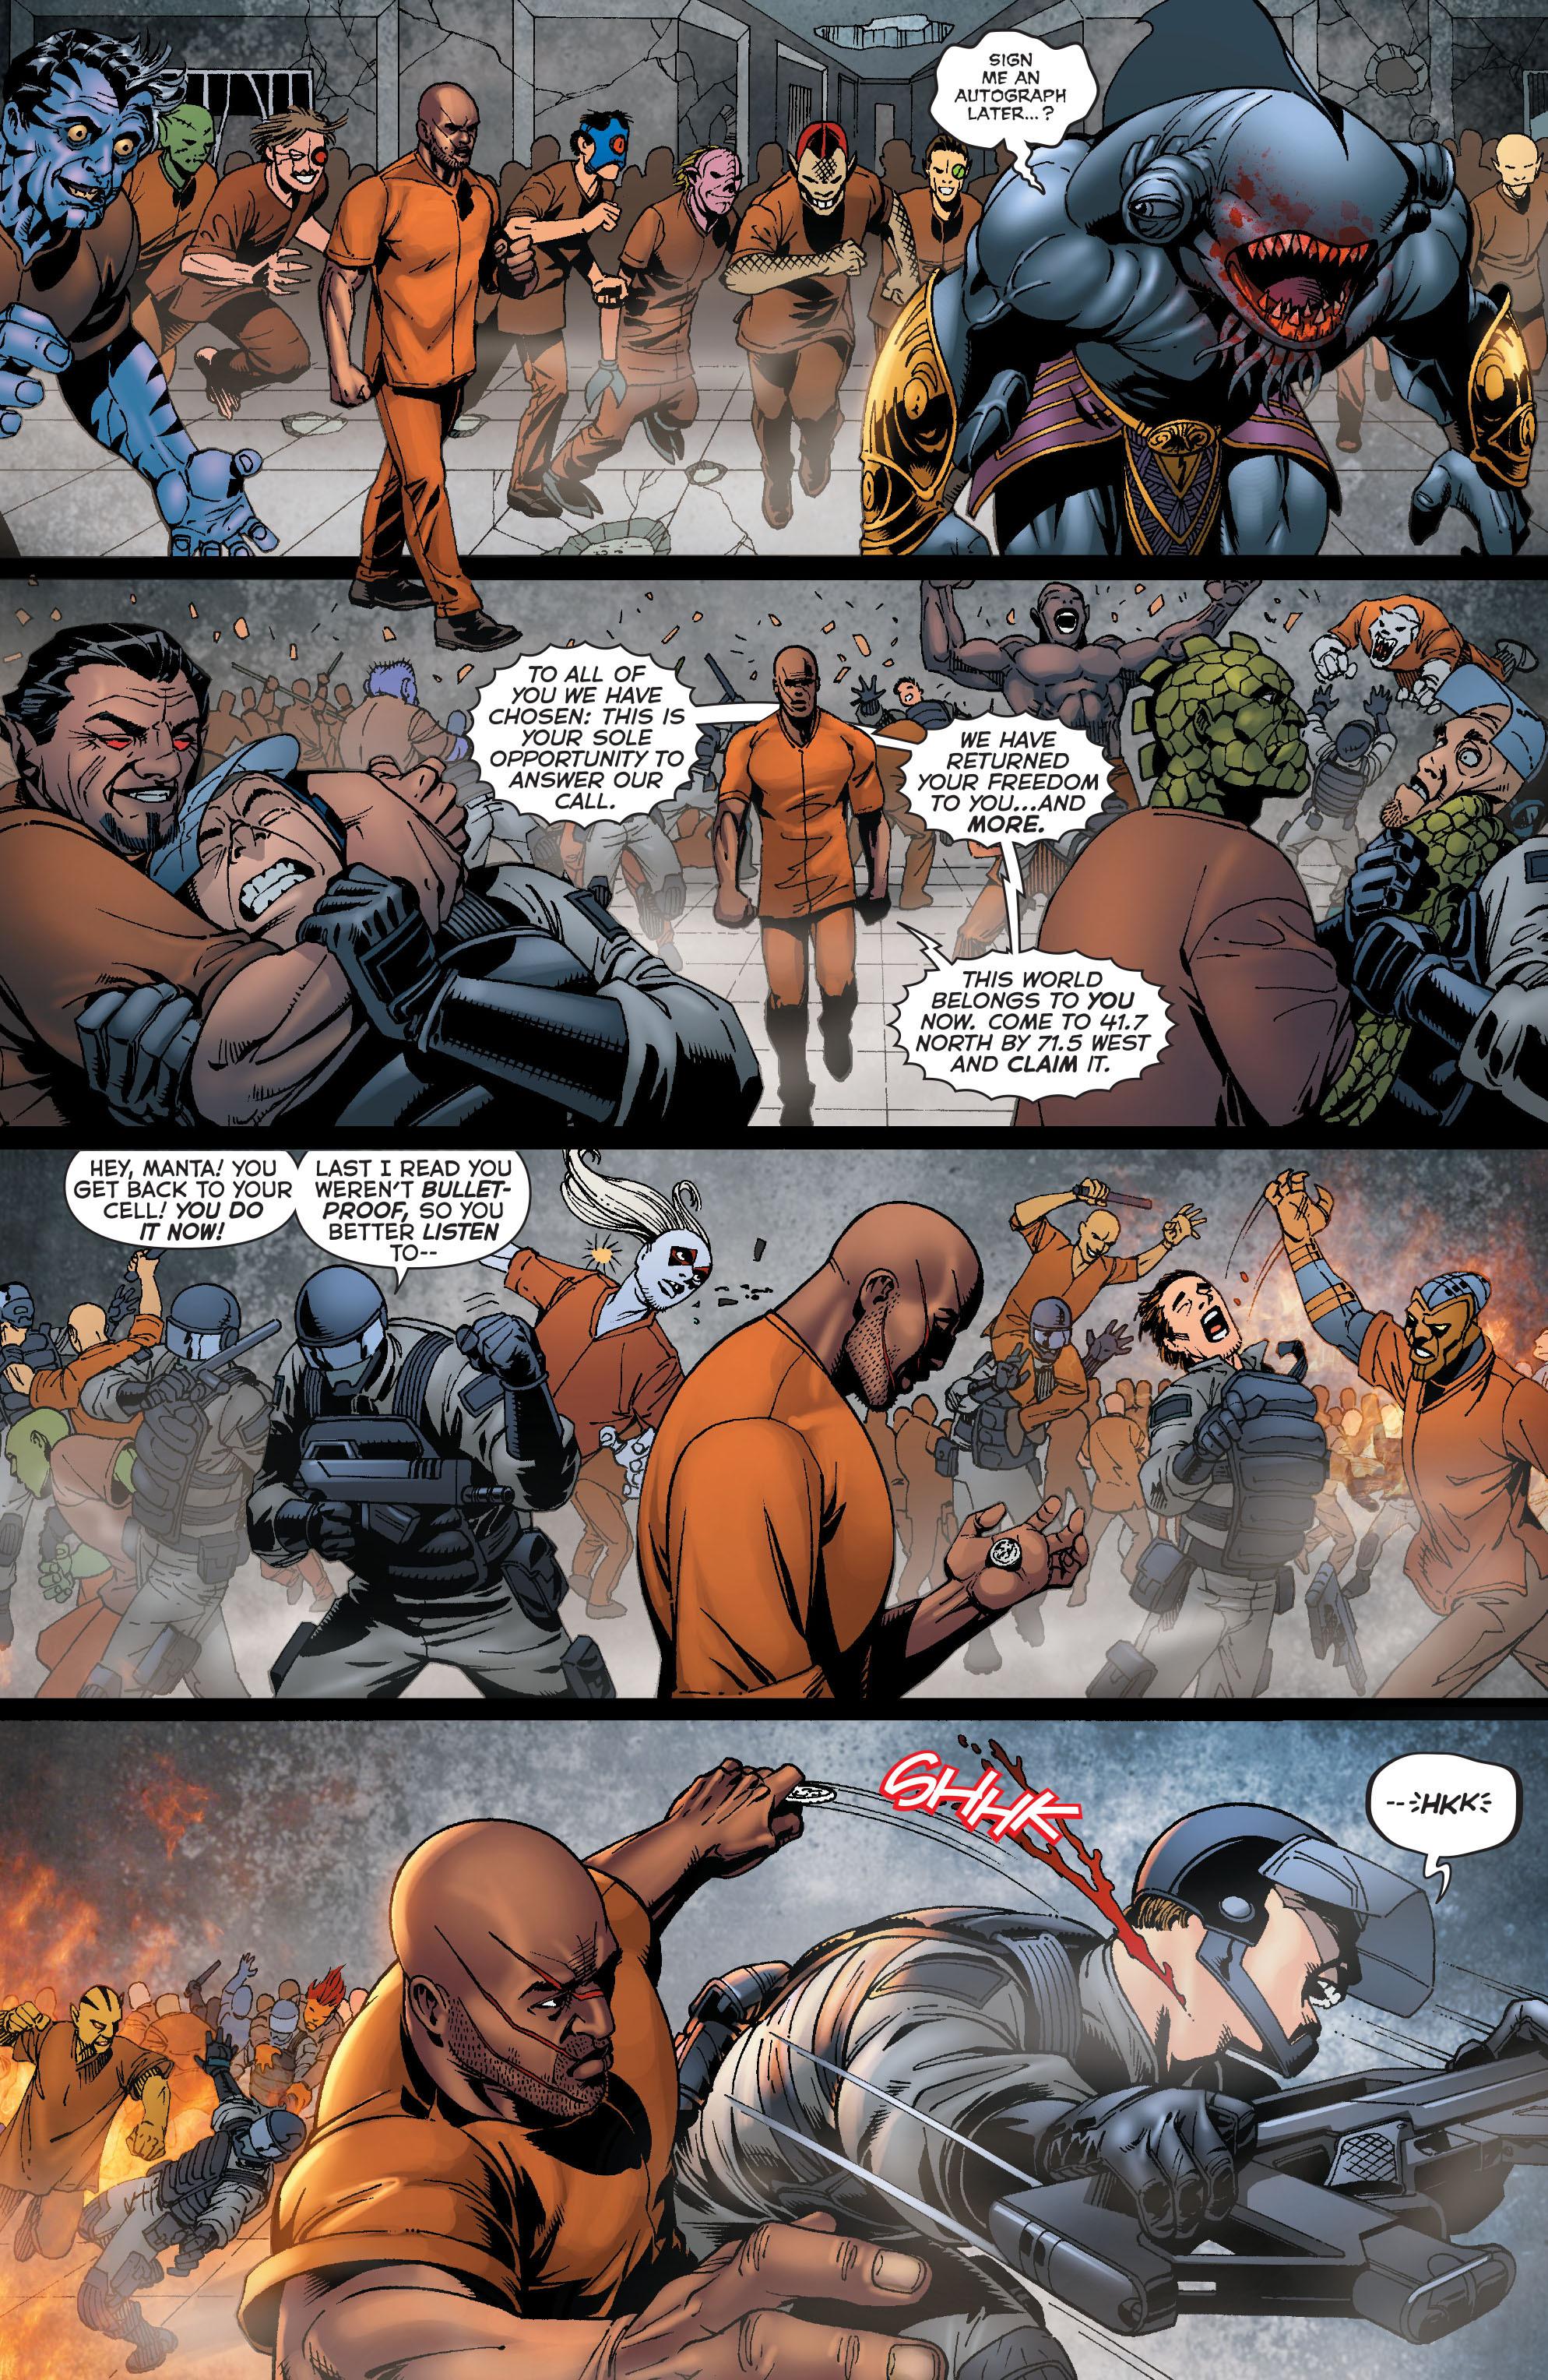 Read online Aquaman (2011) comic -  Issue #23.1 - 8